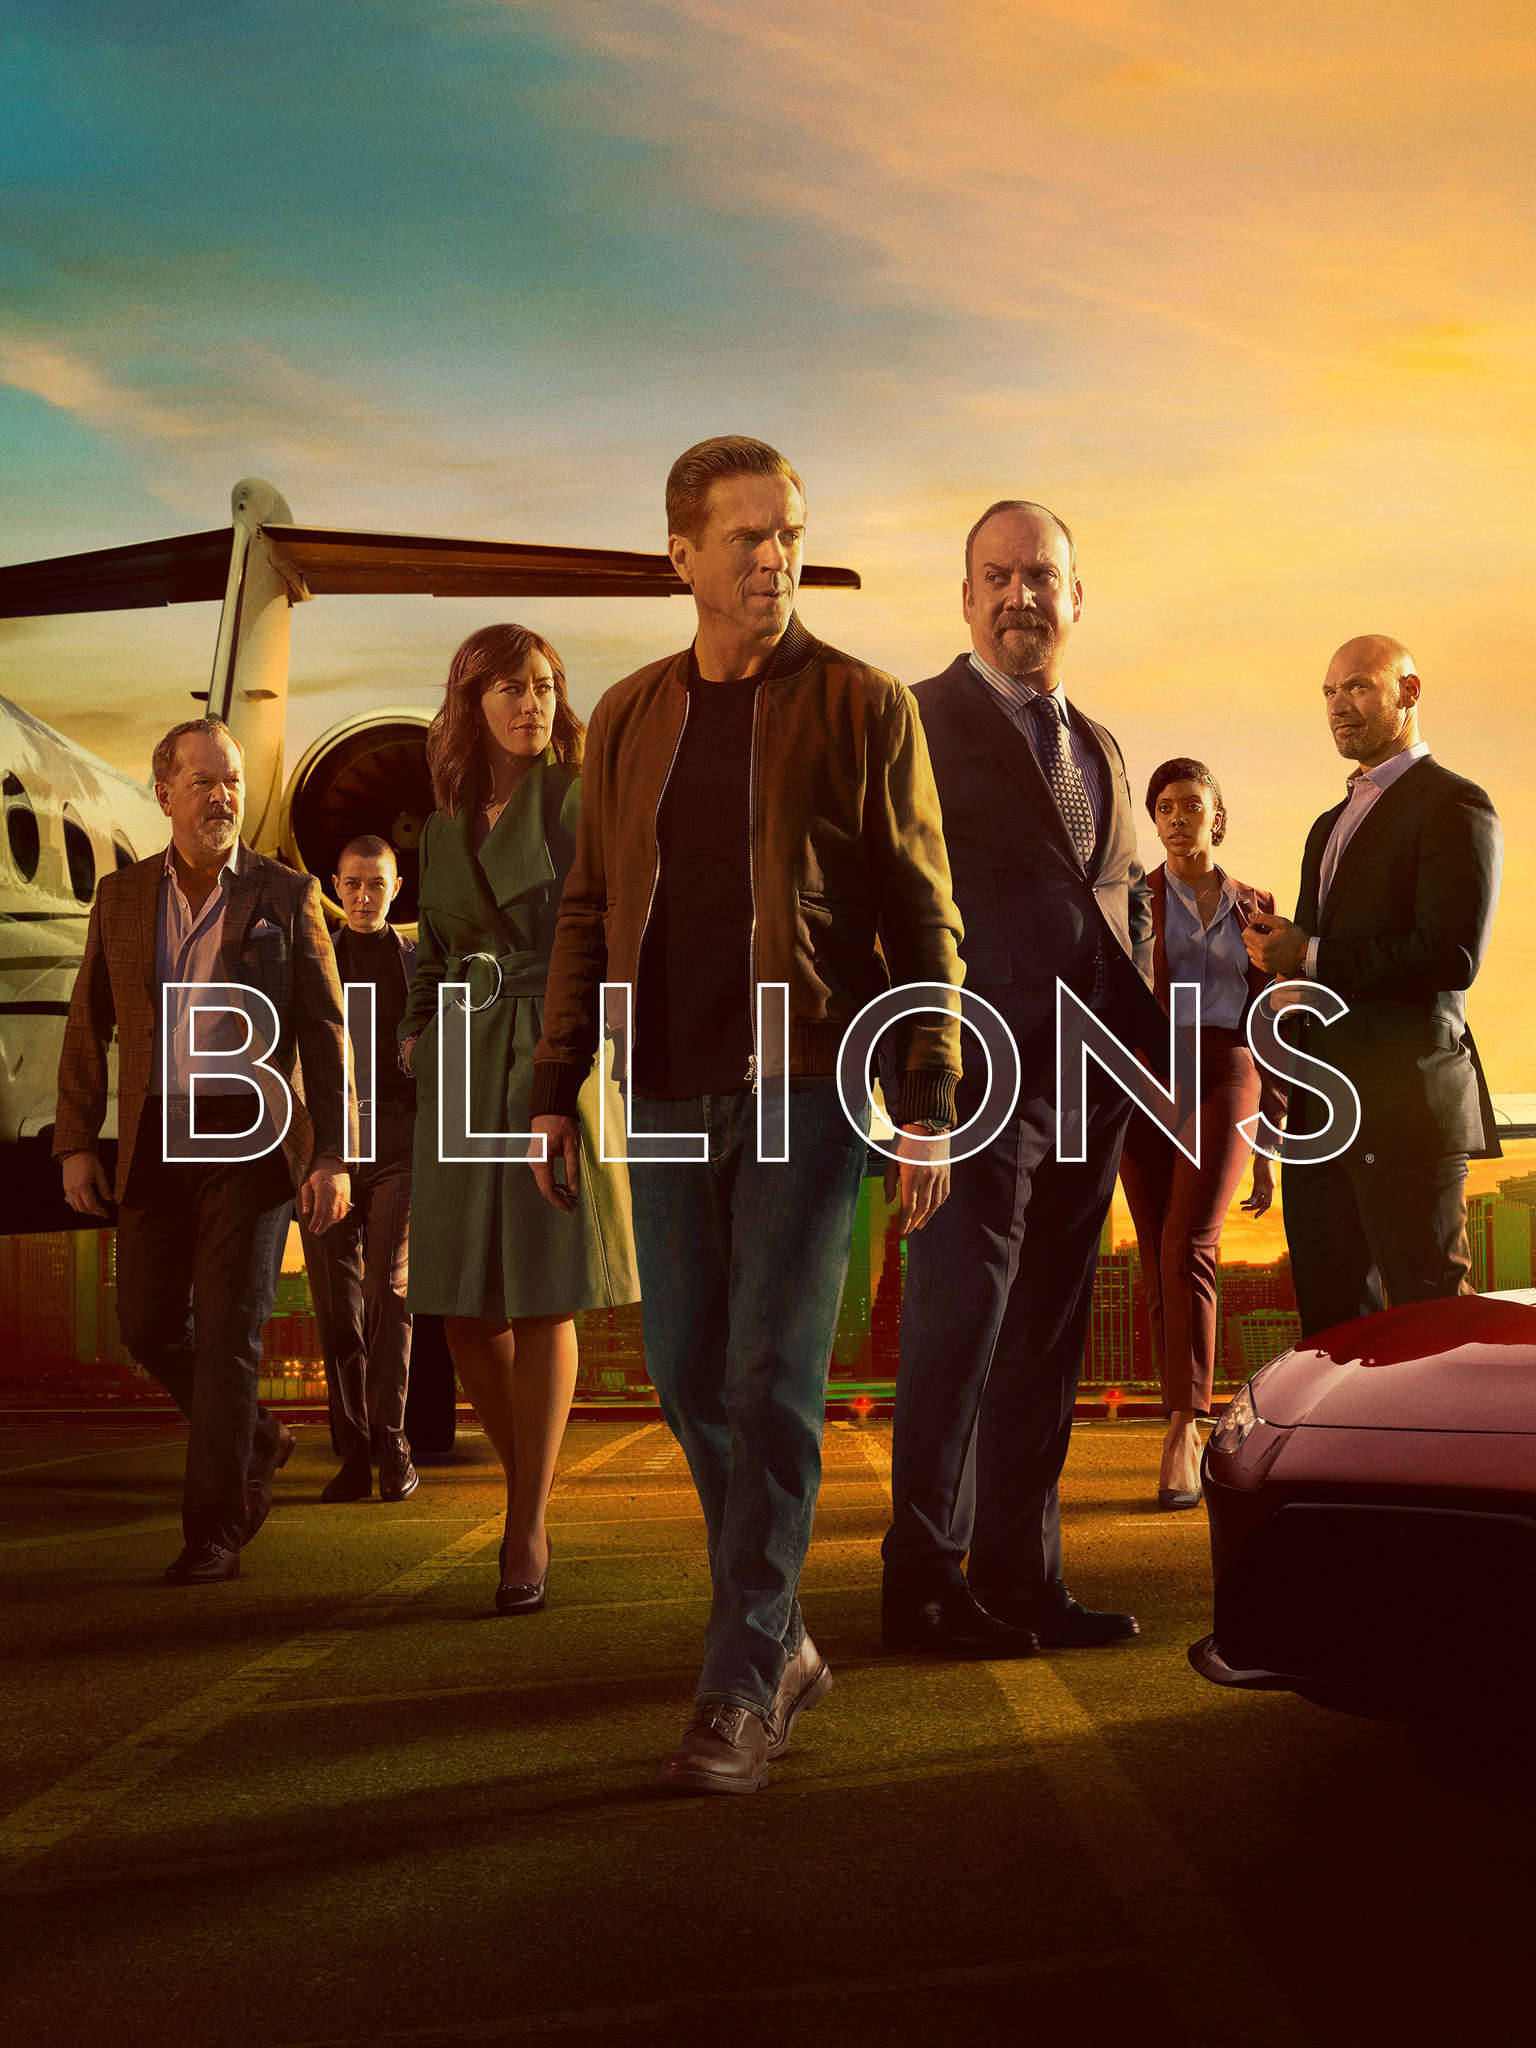 Billions (TV Series 2016– ) - IMDb